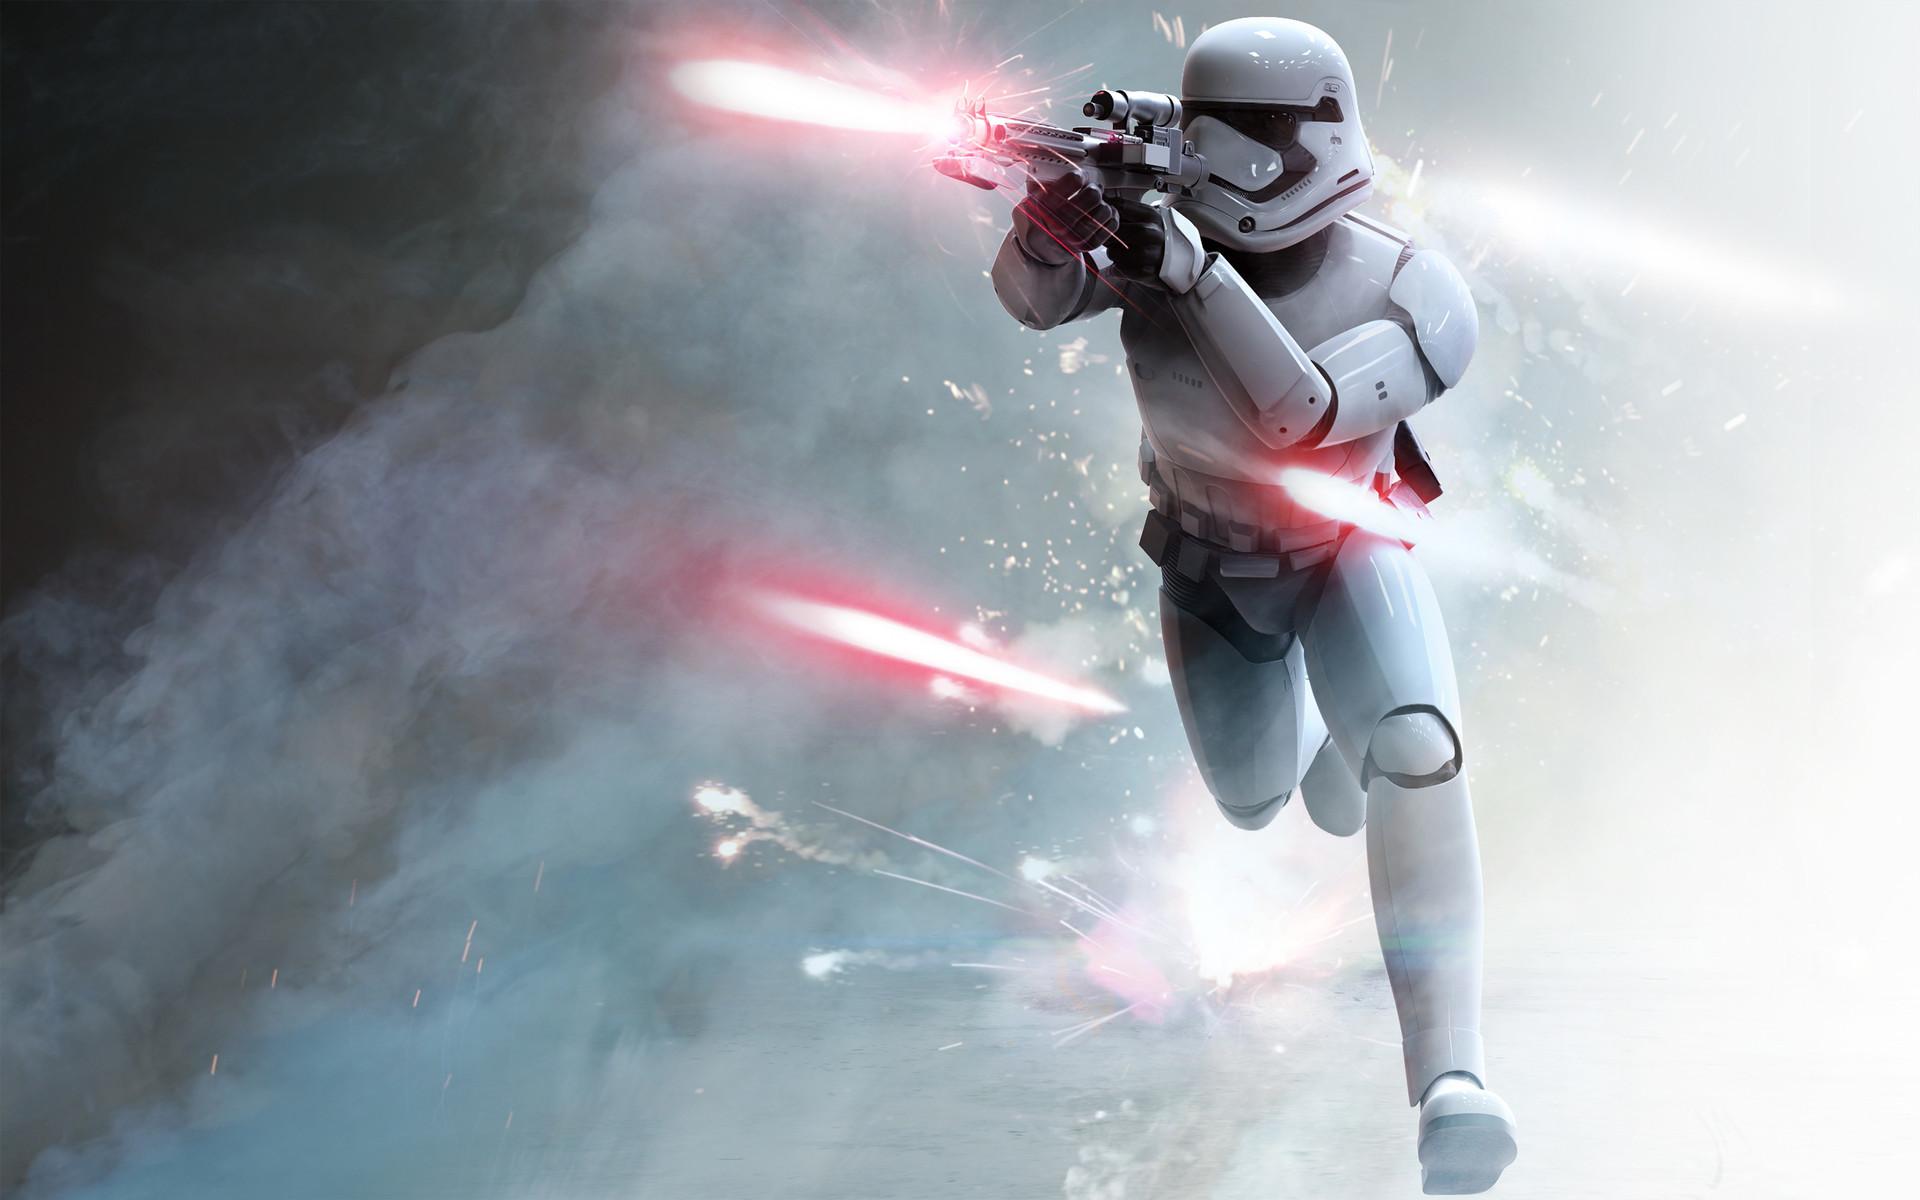 First Order Stormtrooper by Juan Martín …